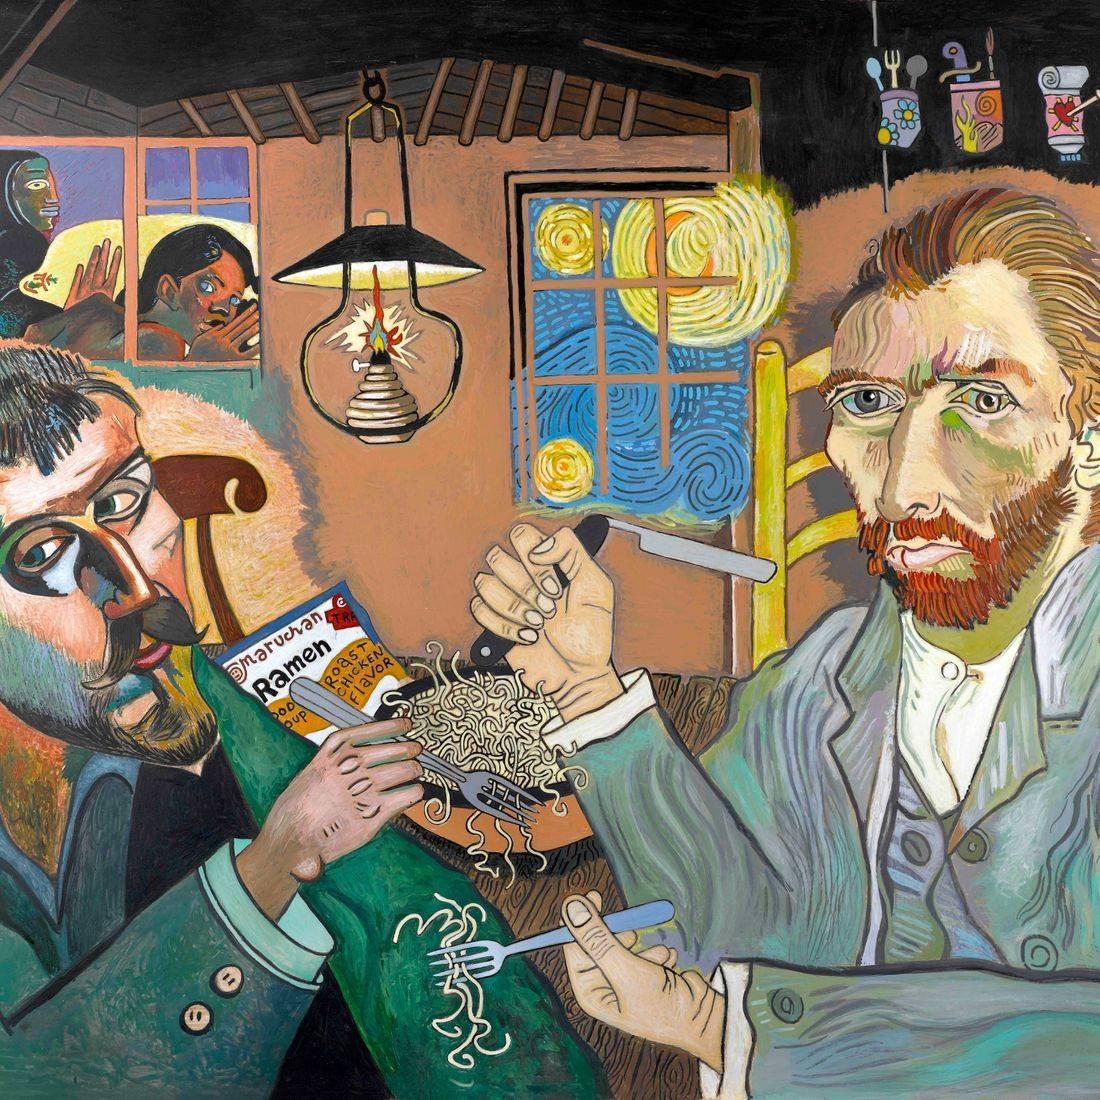 Vincent Van Gogh, Paul Gauguin, Potato Eaters, Ramen Soup, Starry Night, Death Watches Over, Starving Artists